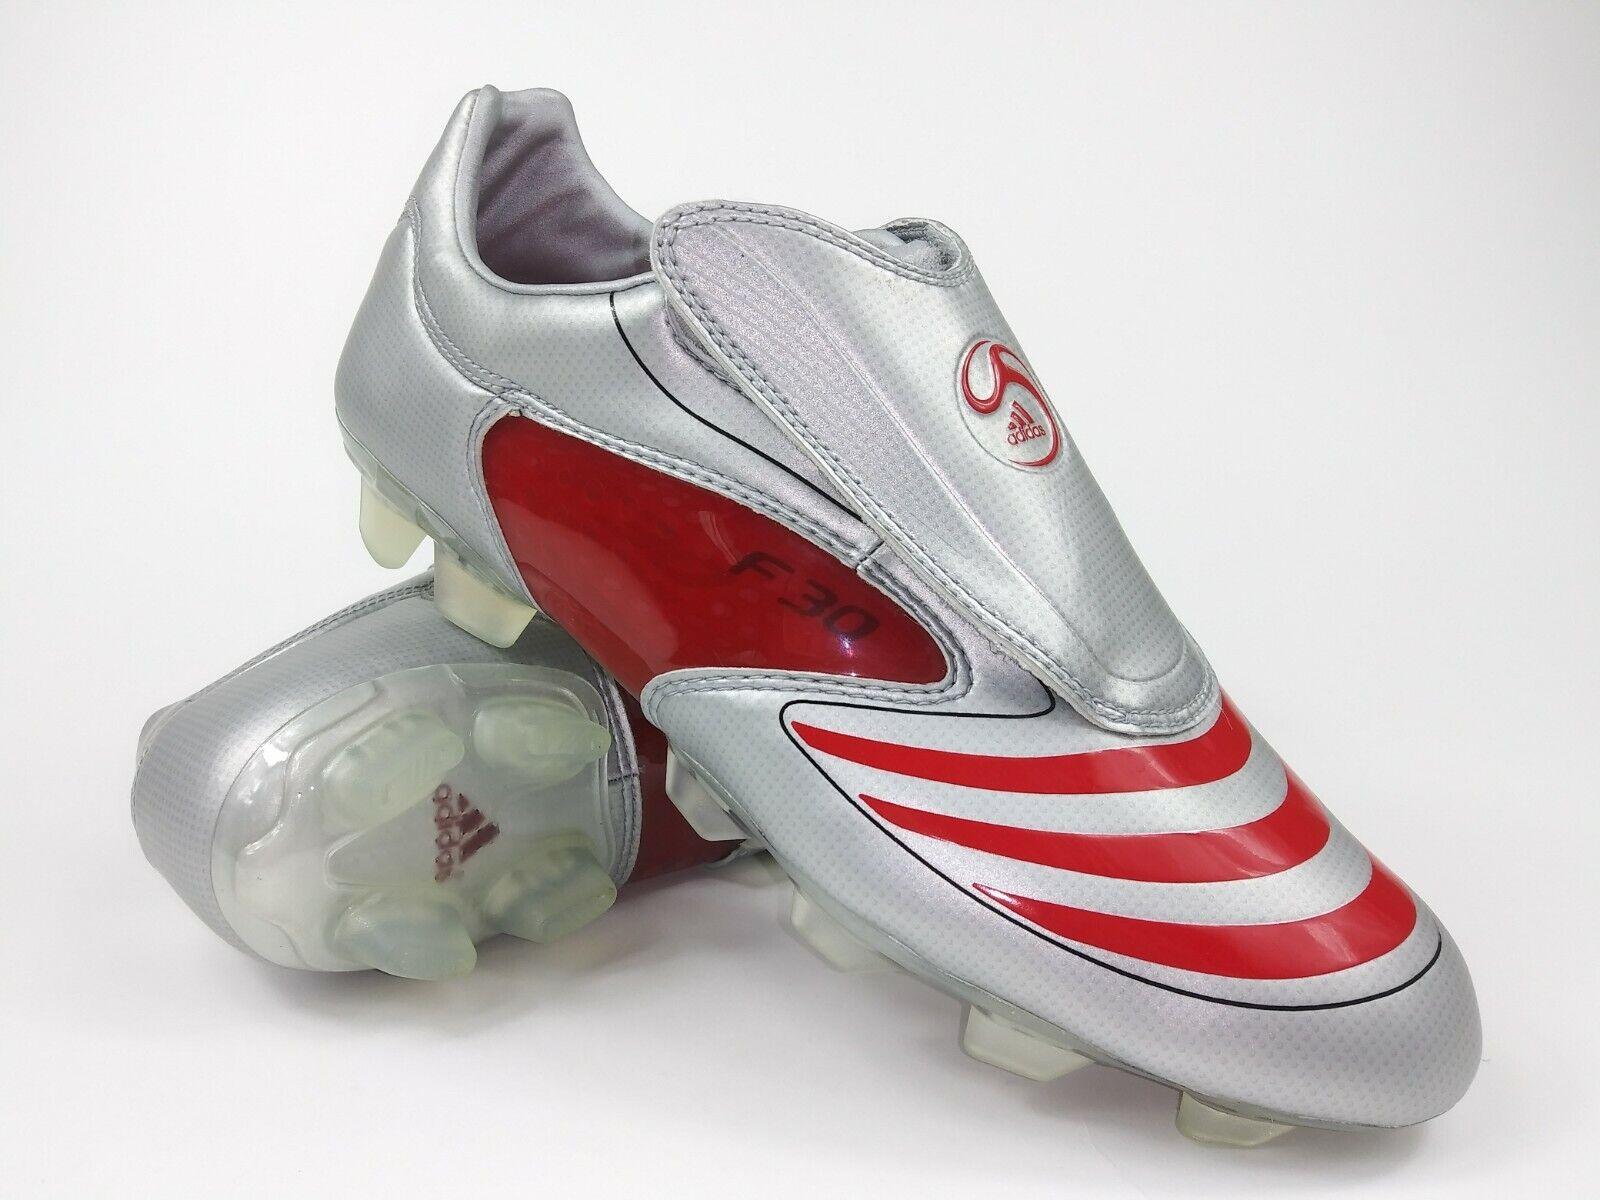 Adidas señores rare f30.8 TRX FG 034294 plata rojo botas de fútbol galerías